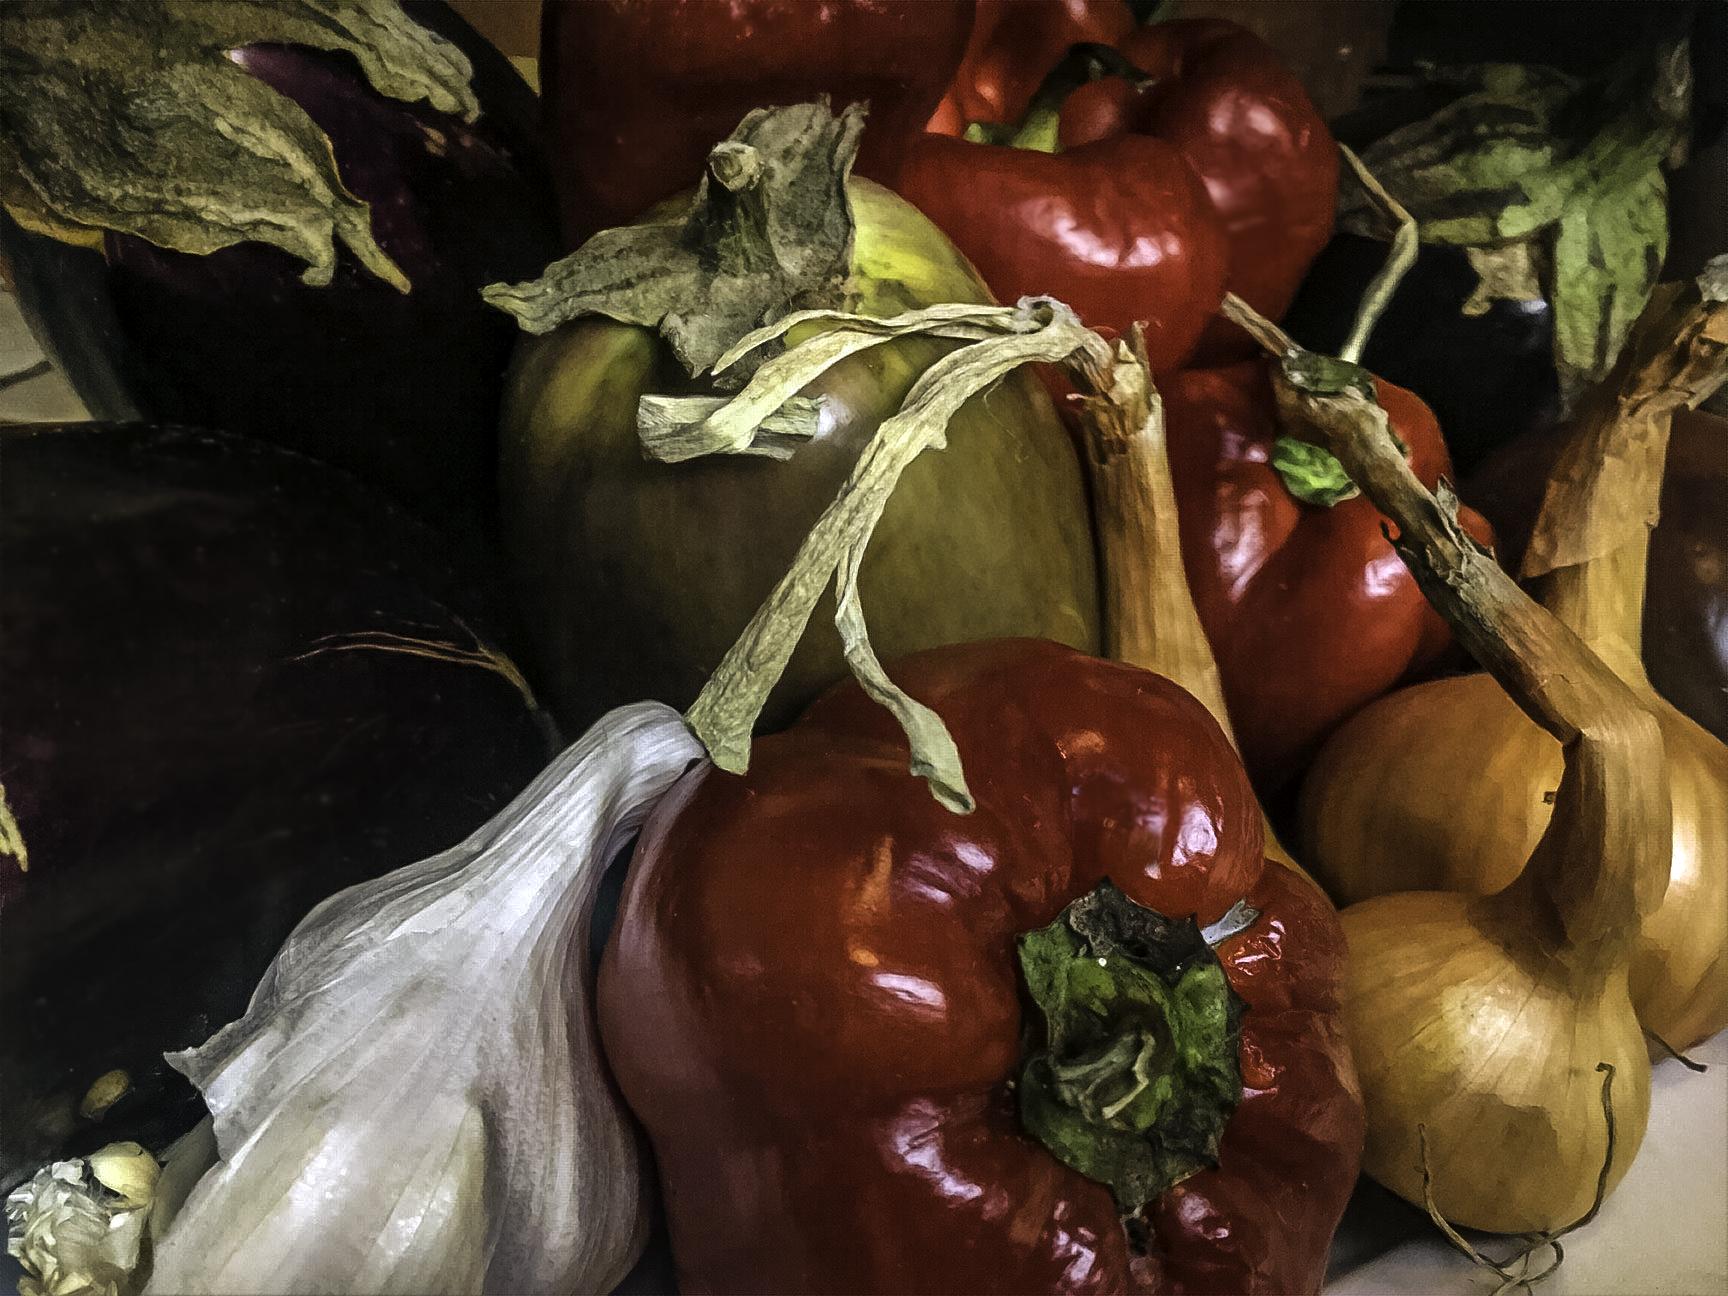 Heirloom veggies from the farmer's market